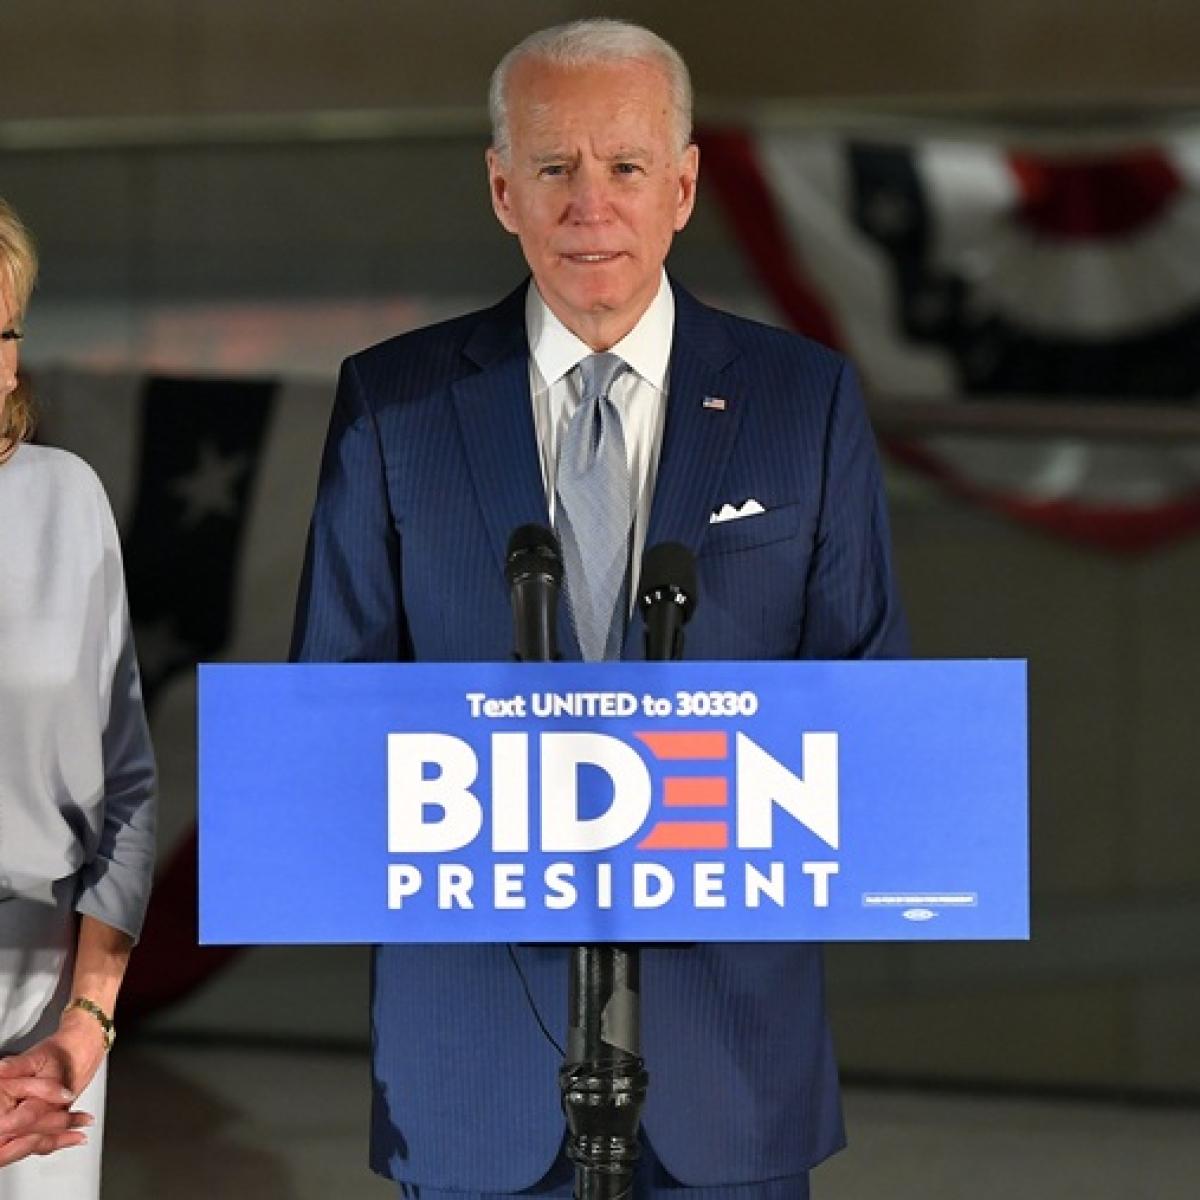 Joe Biden wins Mississippi and Missouri Democratic primary in early blow to Bernie Sanders